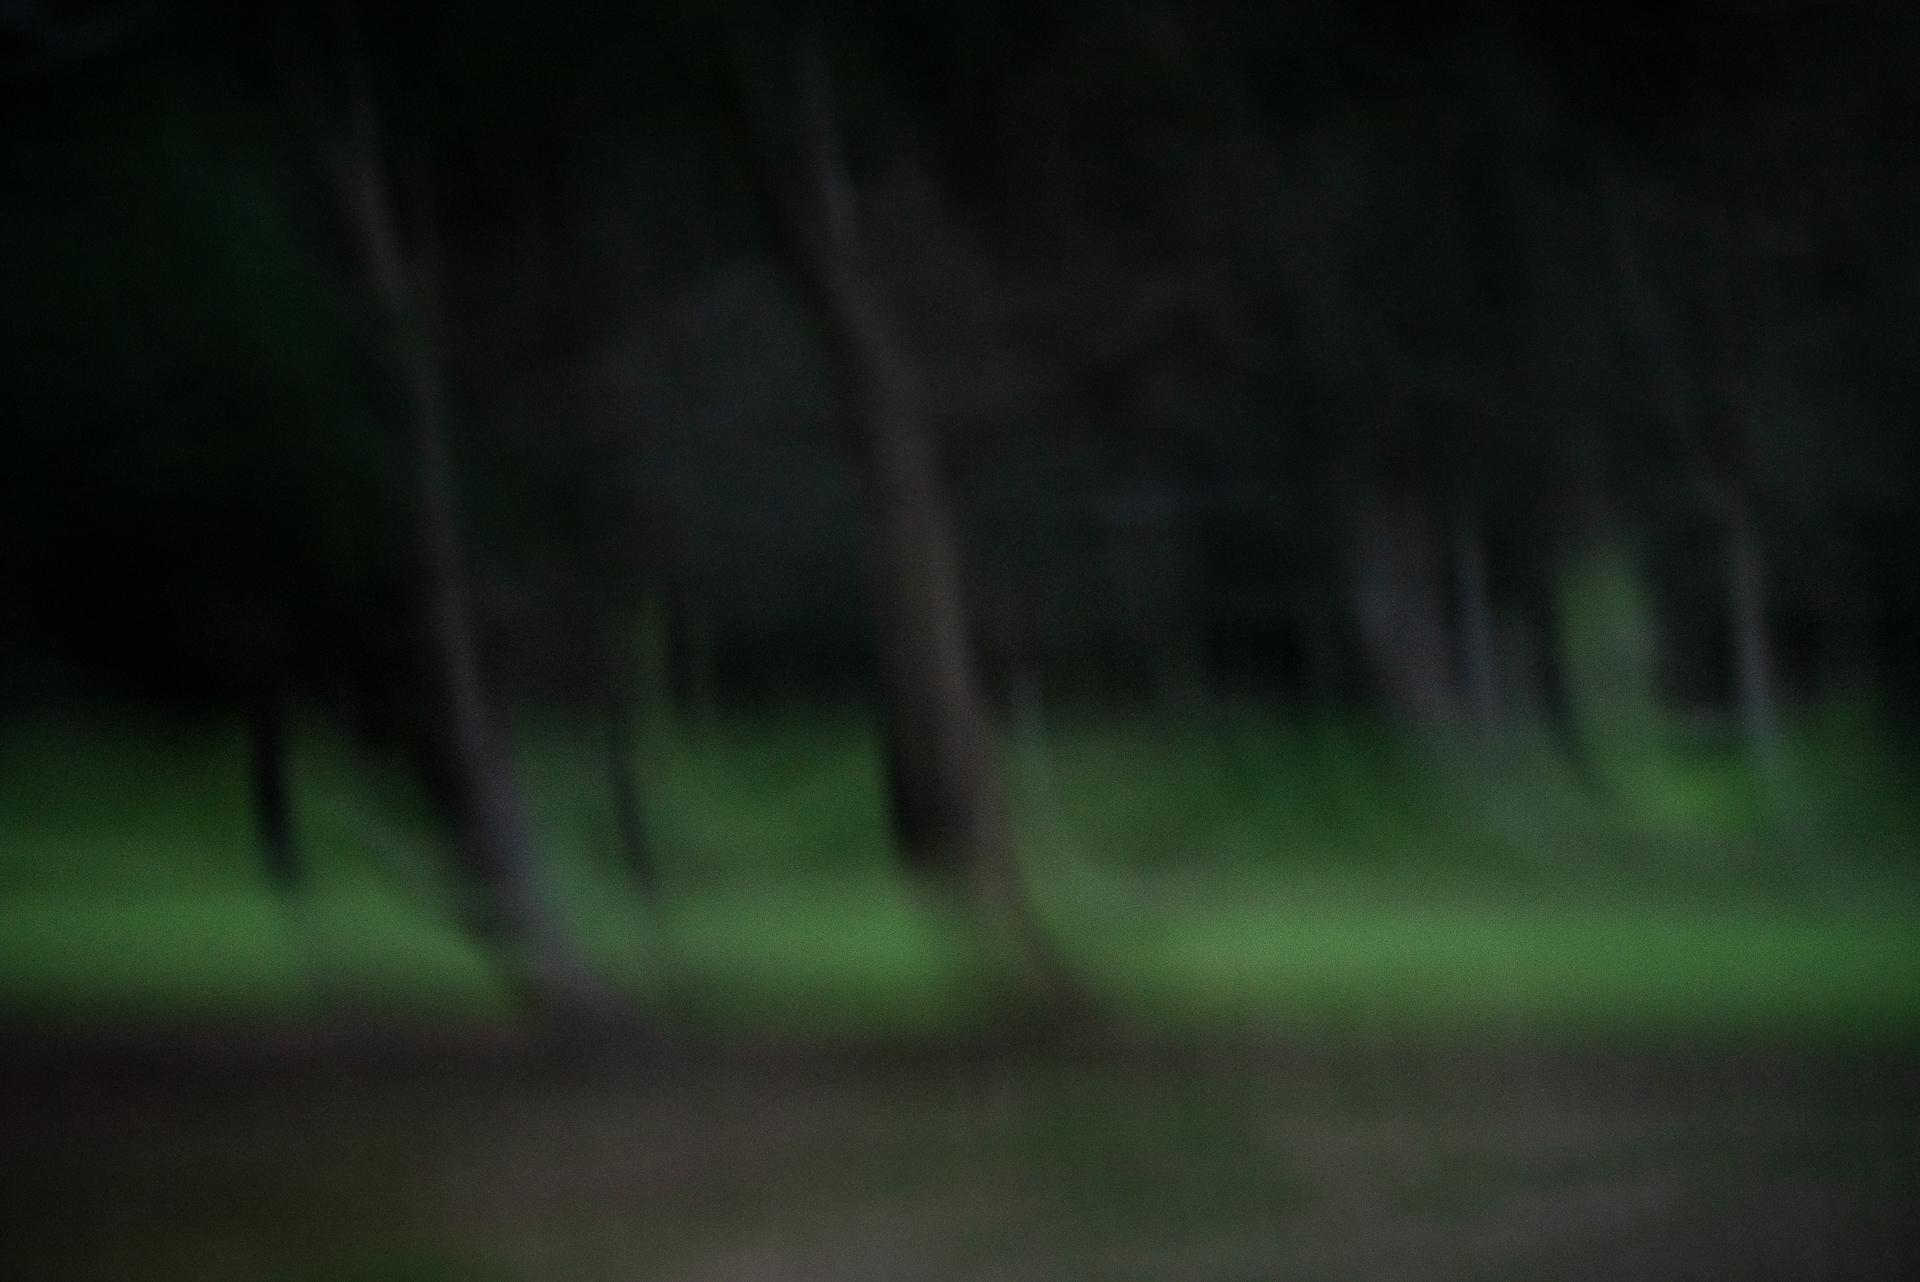 Dusk in the park